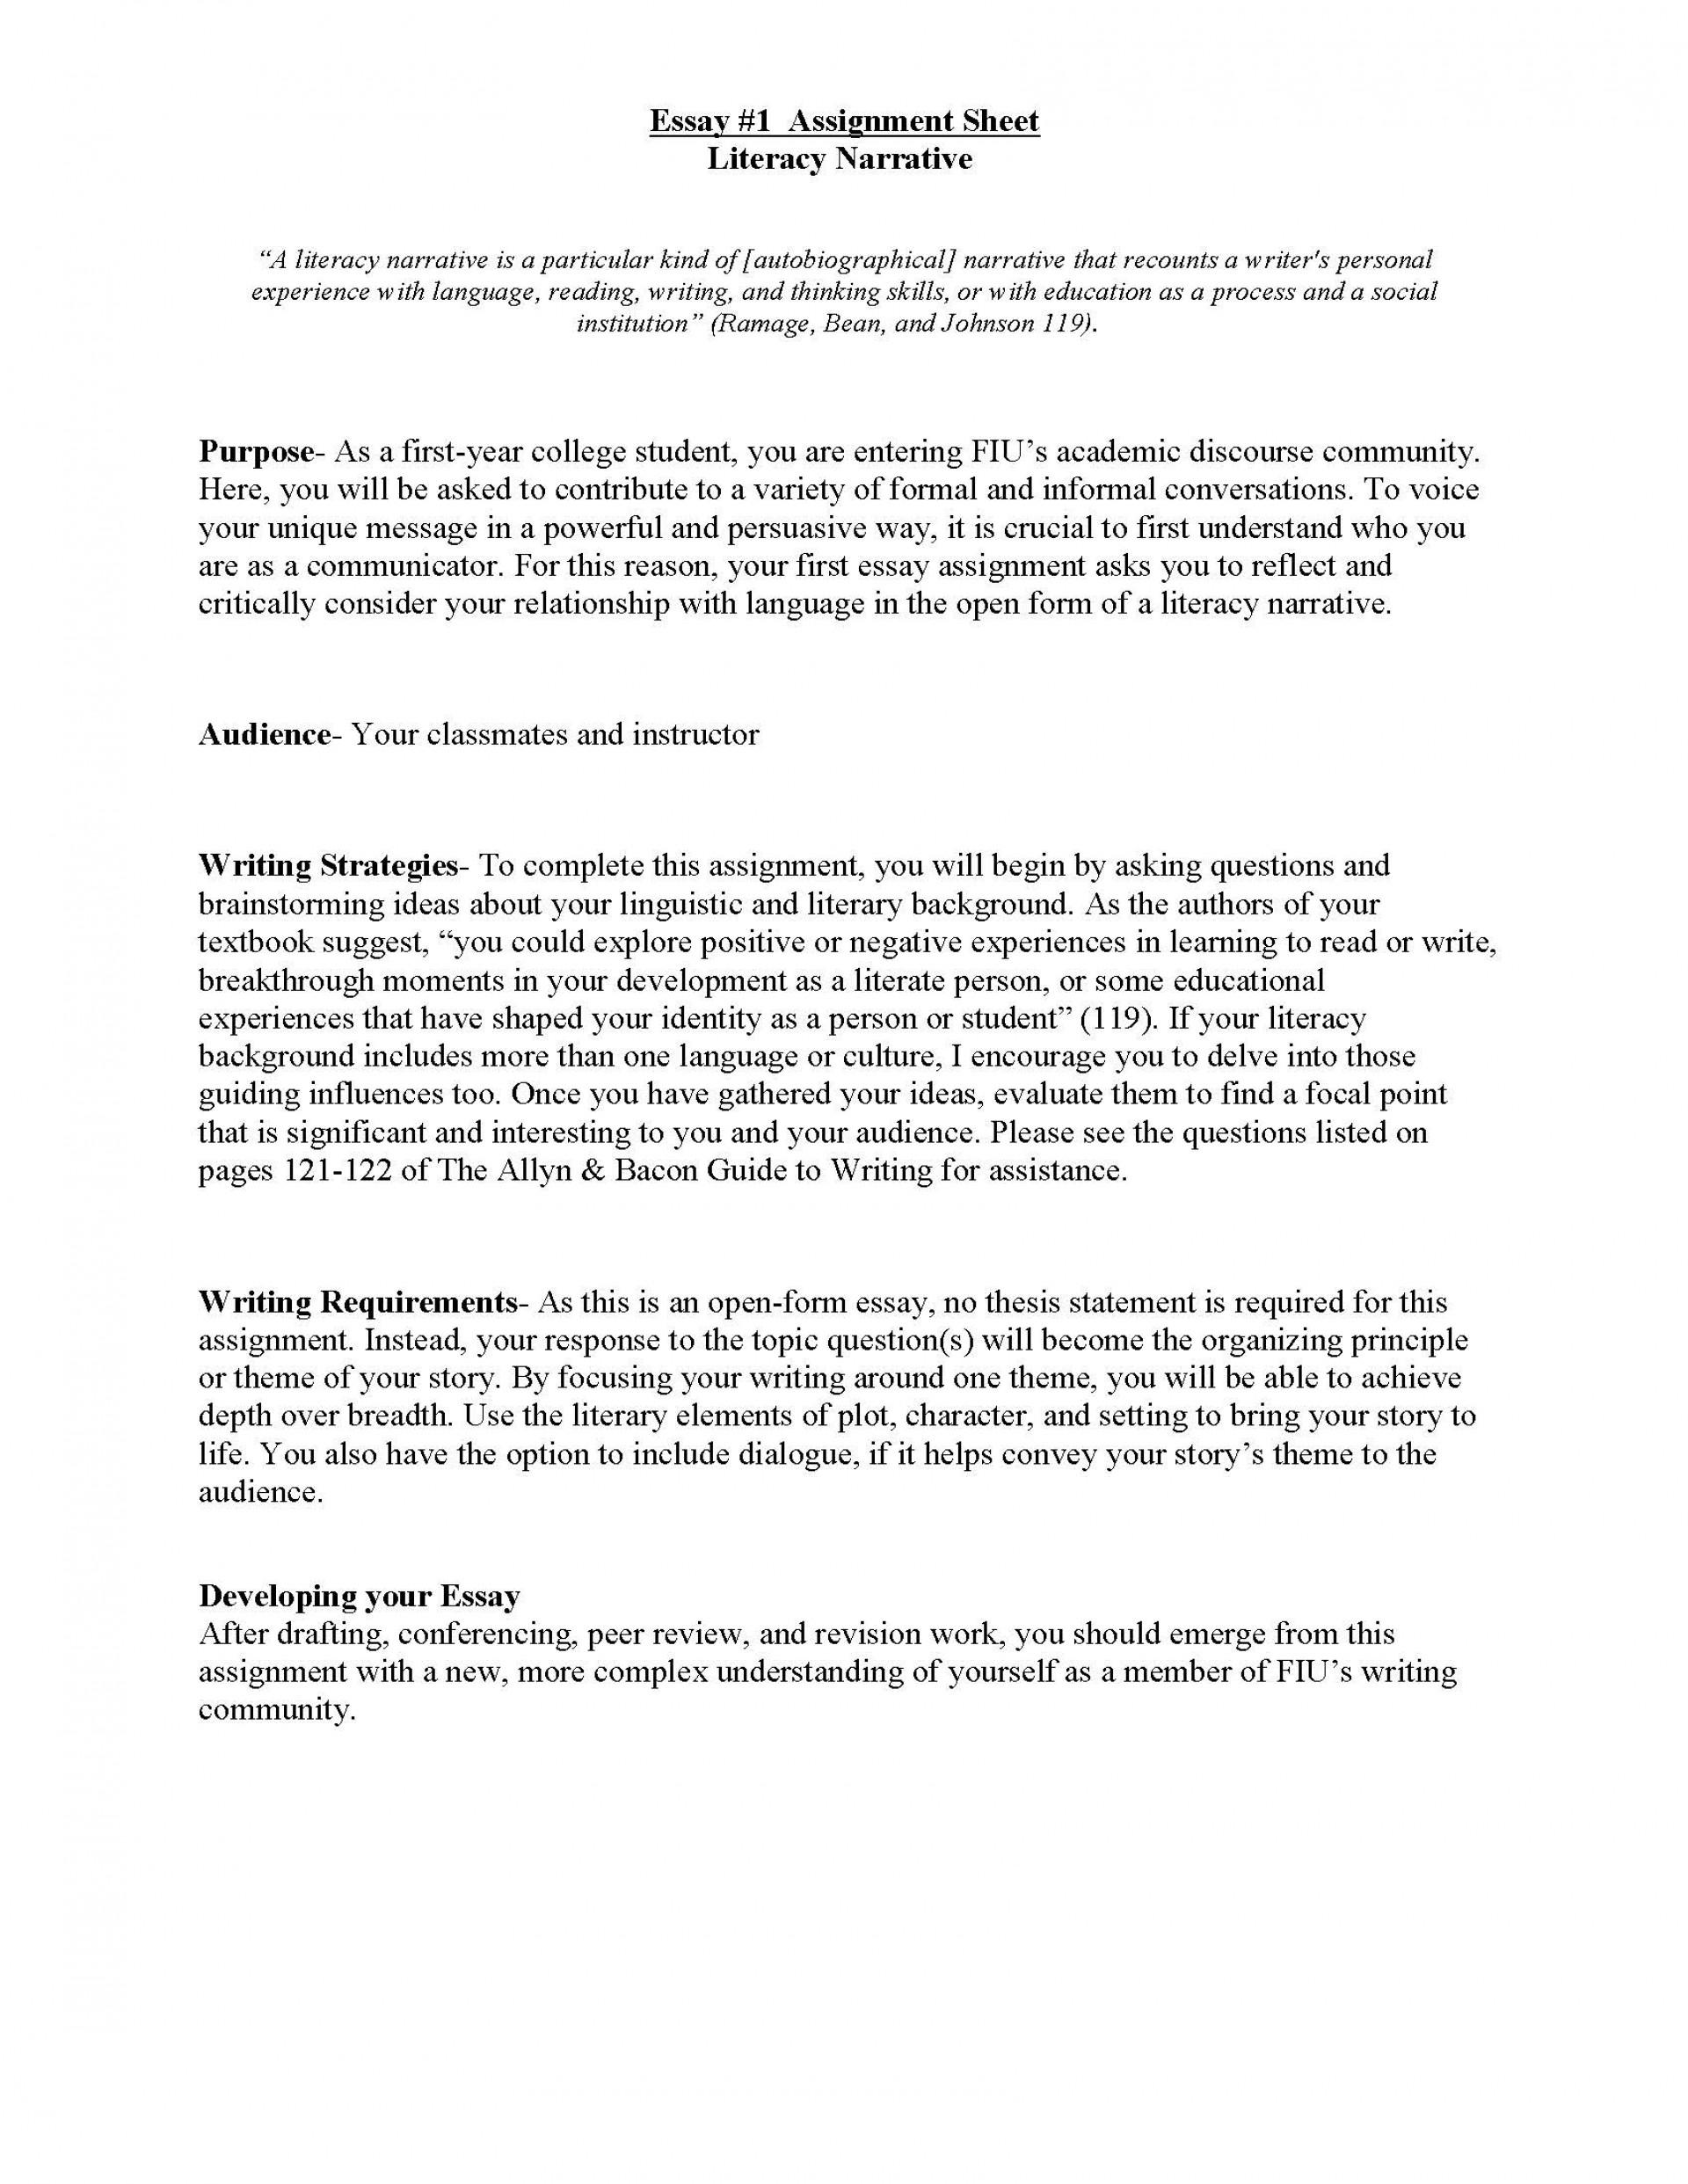 essay essay writing high school brandforesightco with grade level  short narrative essay sample pdf essay example narrative for essay example  narrative for high school goal